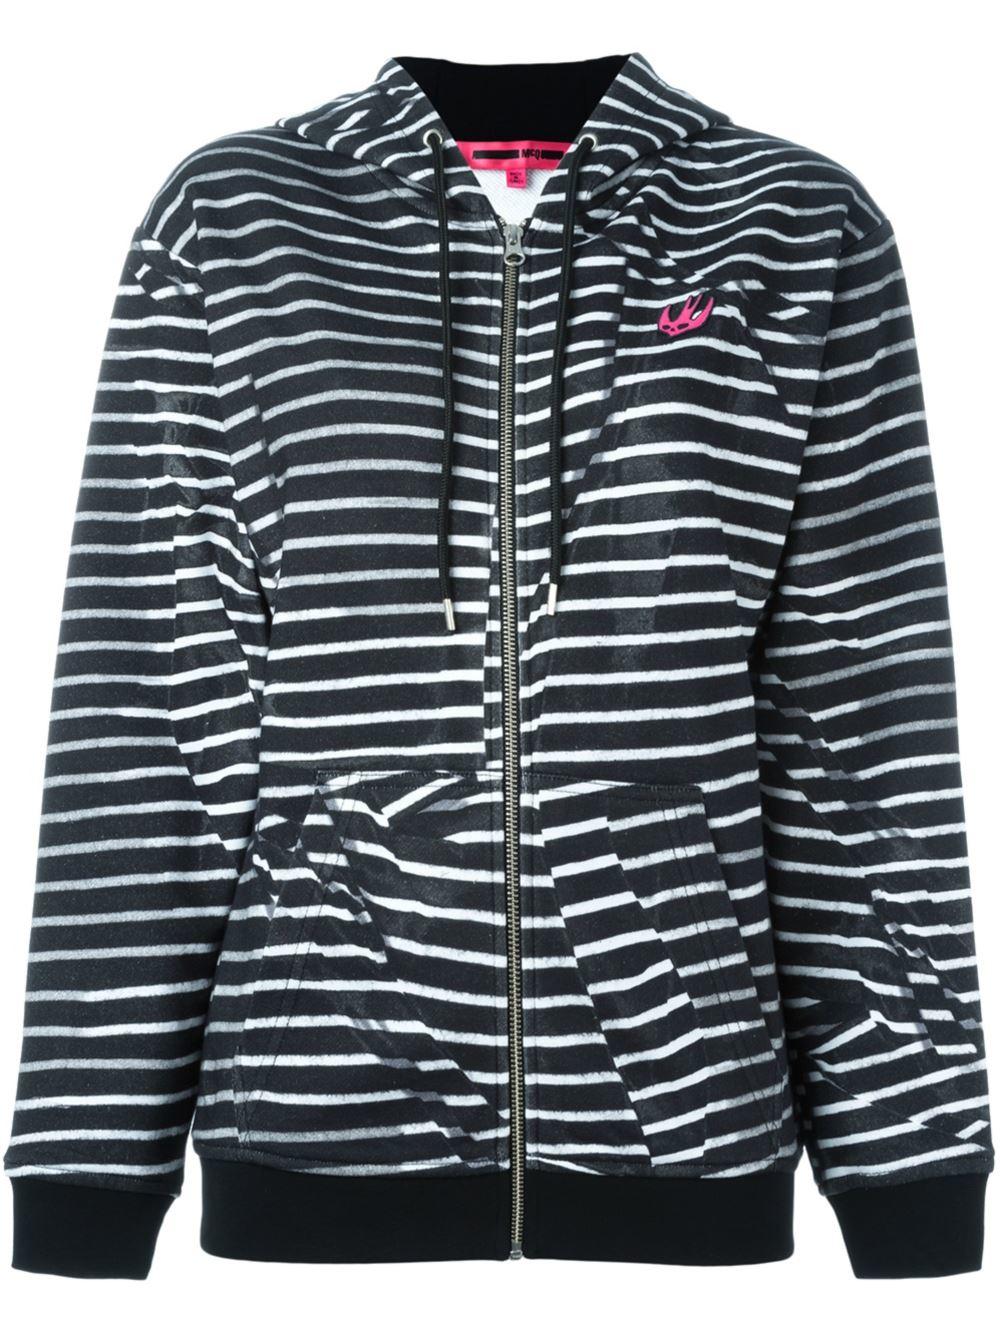 mcq alexander mcqueen 39 swallow 39 striped hoodie in black lyst. Black Bedroom Furniture Sets. Home Design Ideas